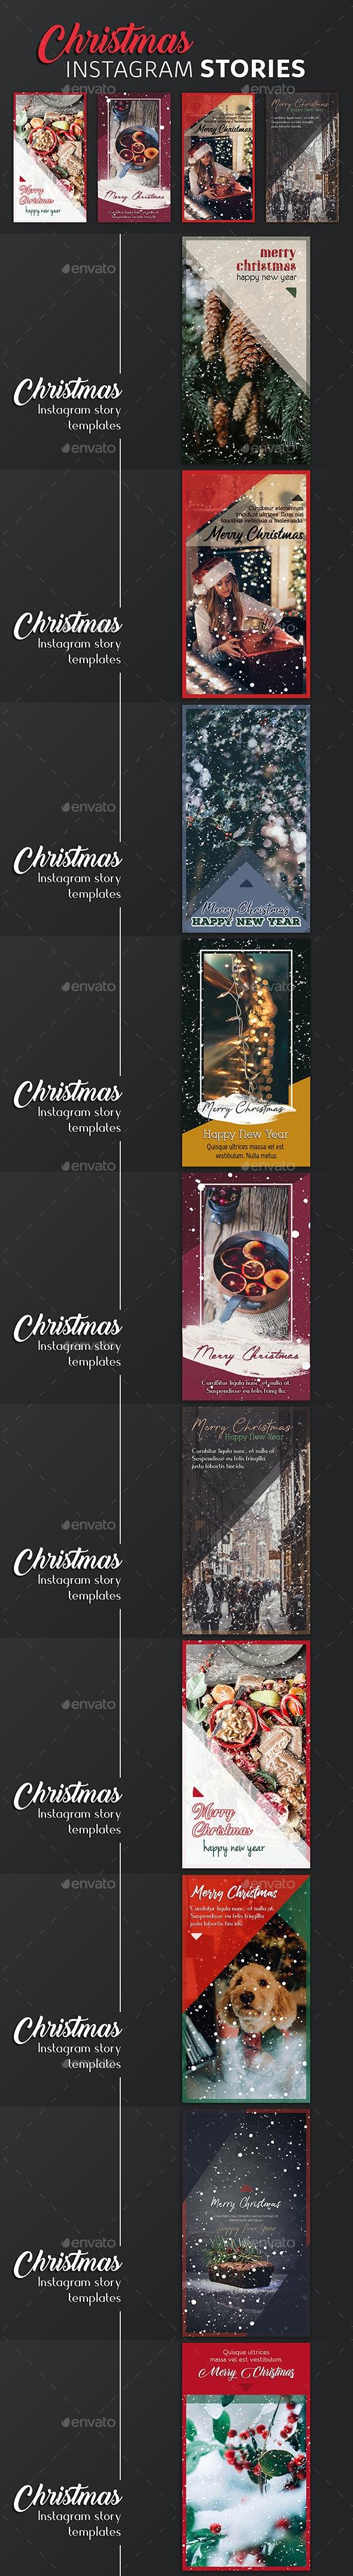 Christmas Instagram Story Templates - Social Media Web Elements